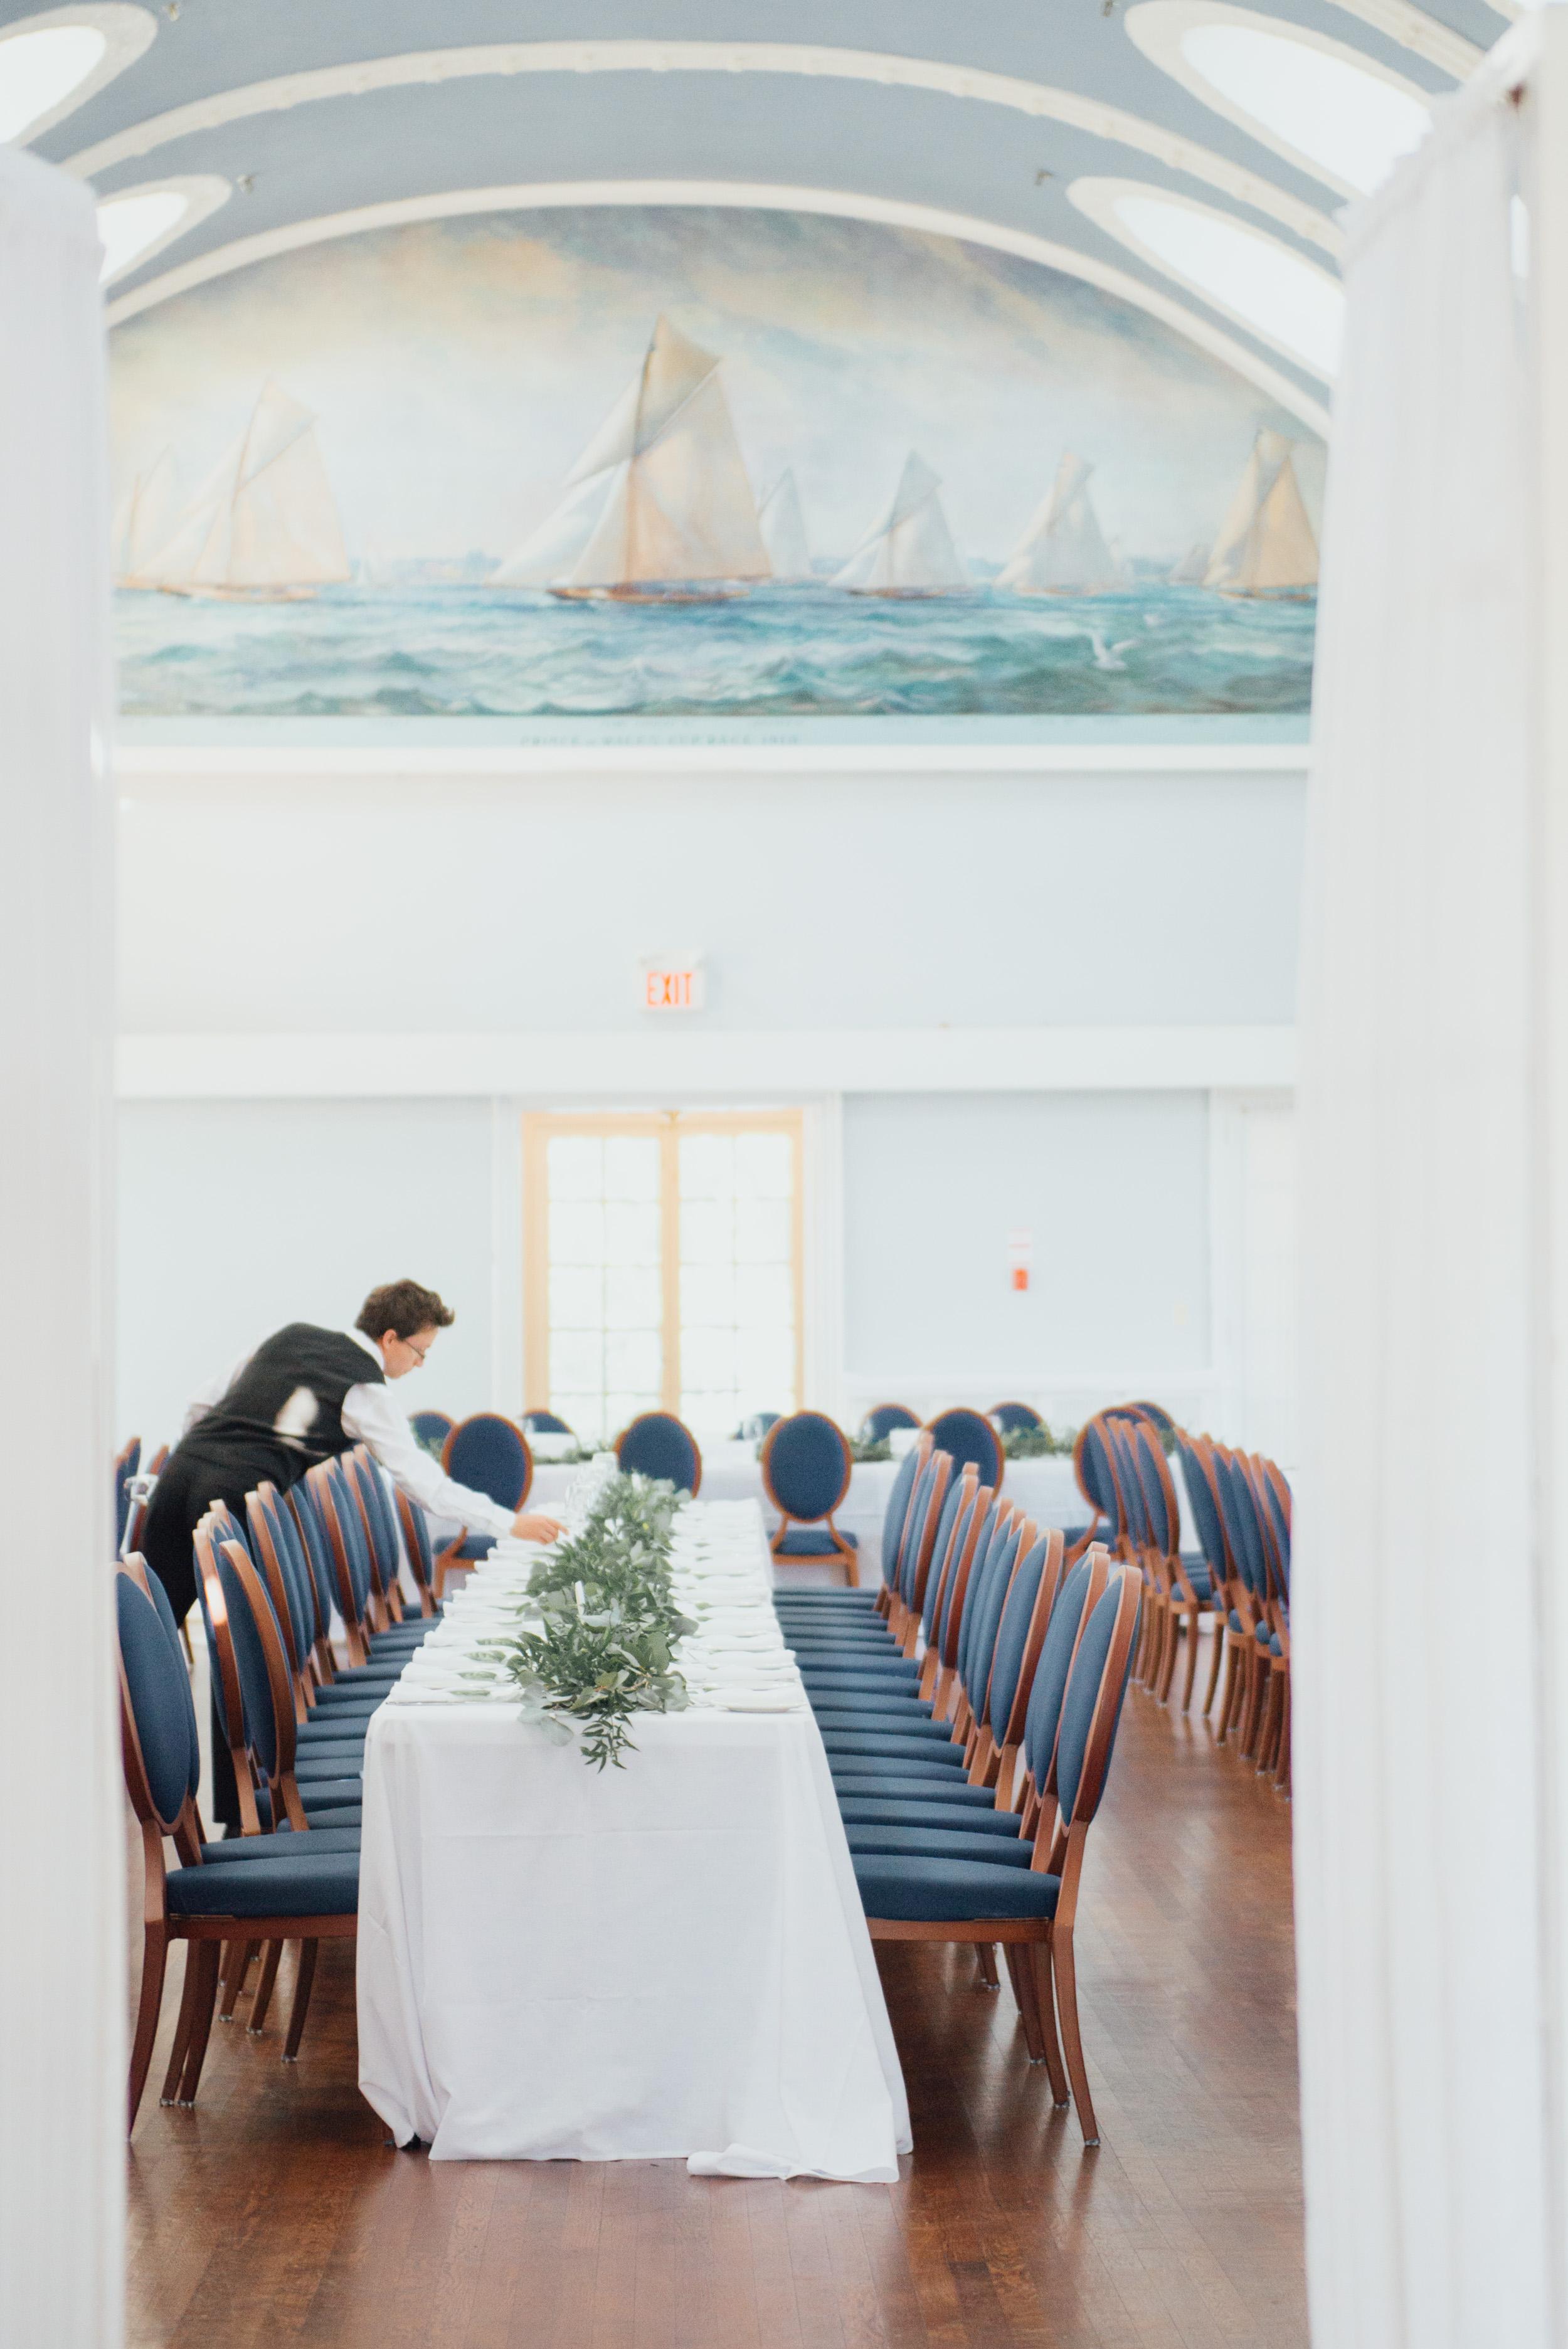 cleland-studios-wedding-photography-20.jpg